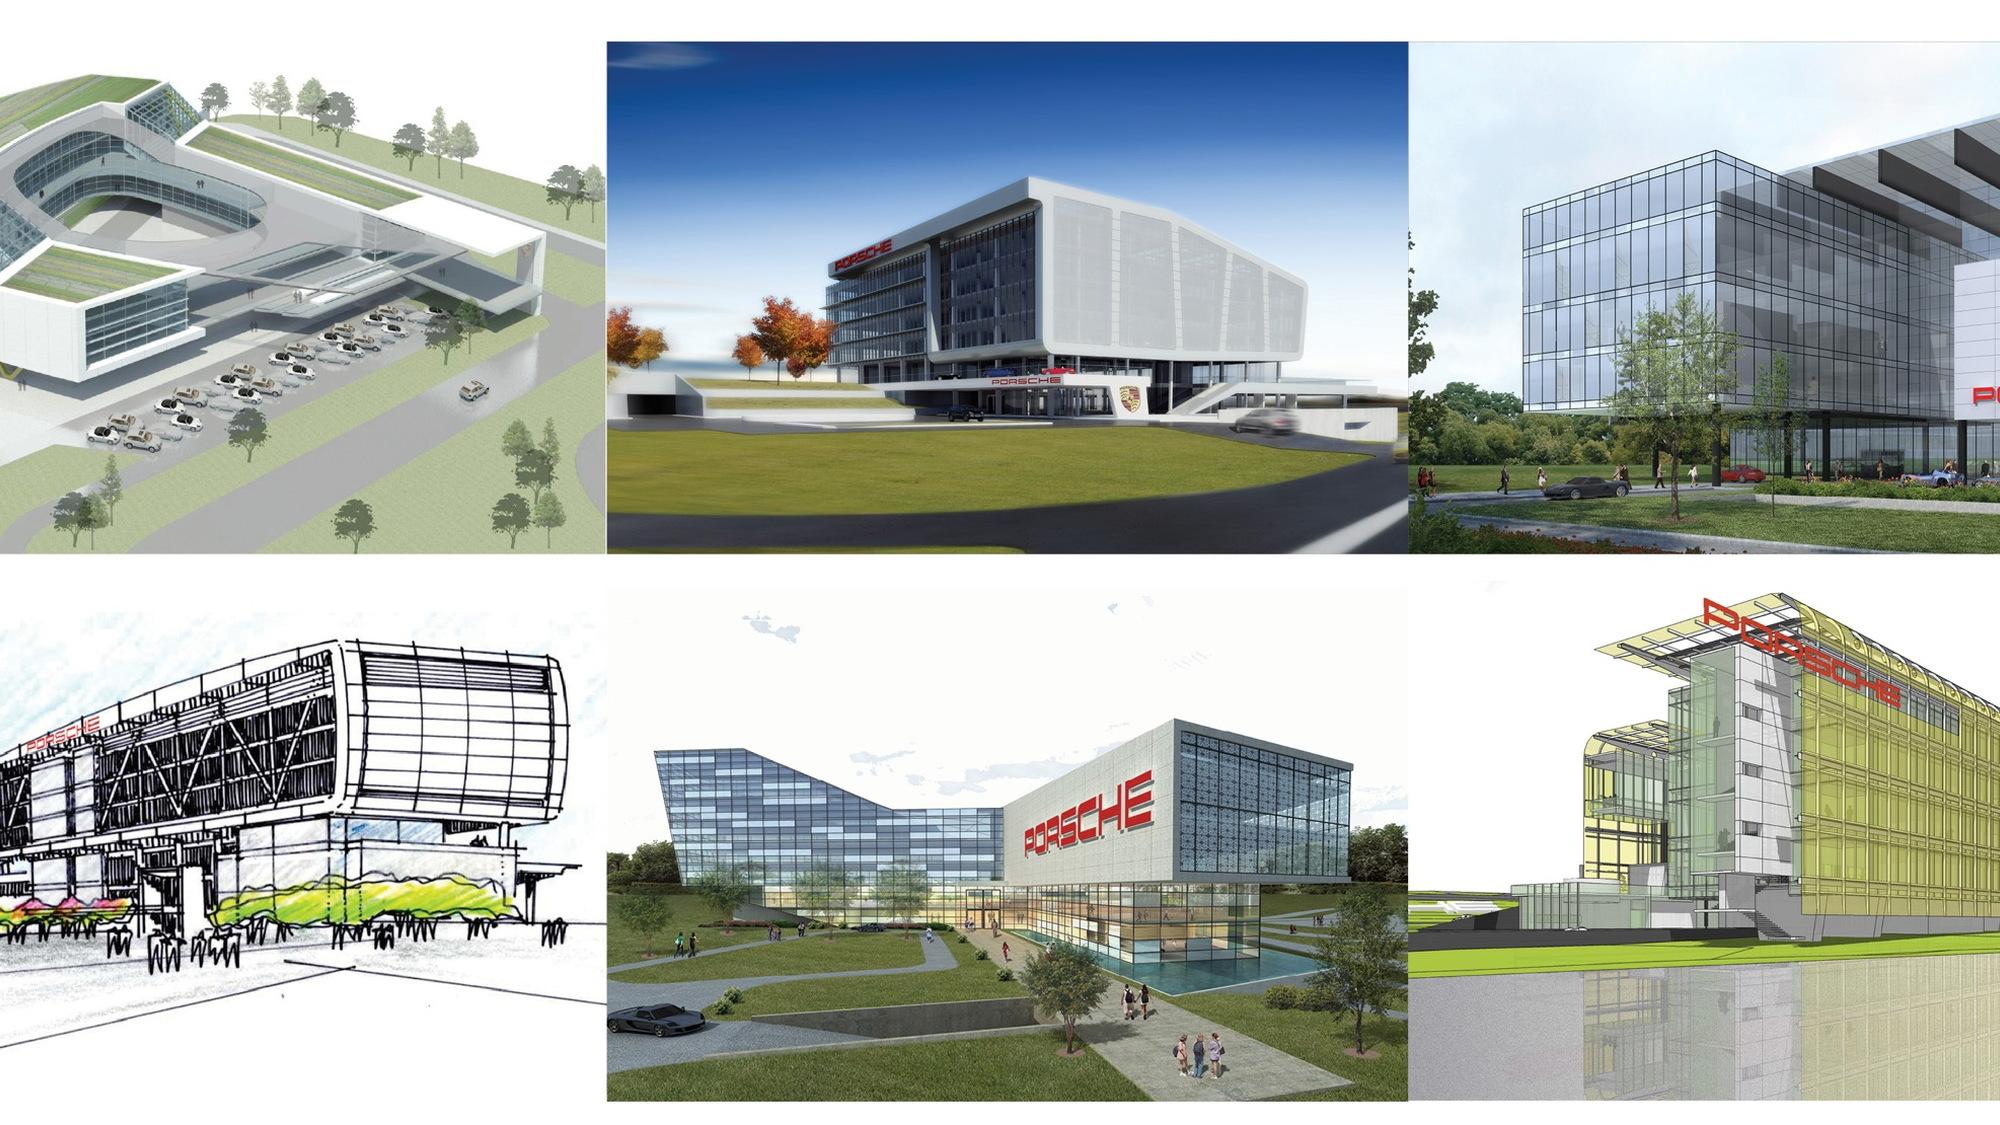 Porsche building designs